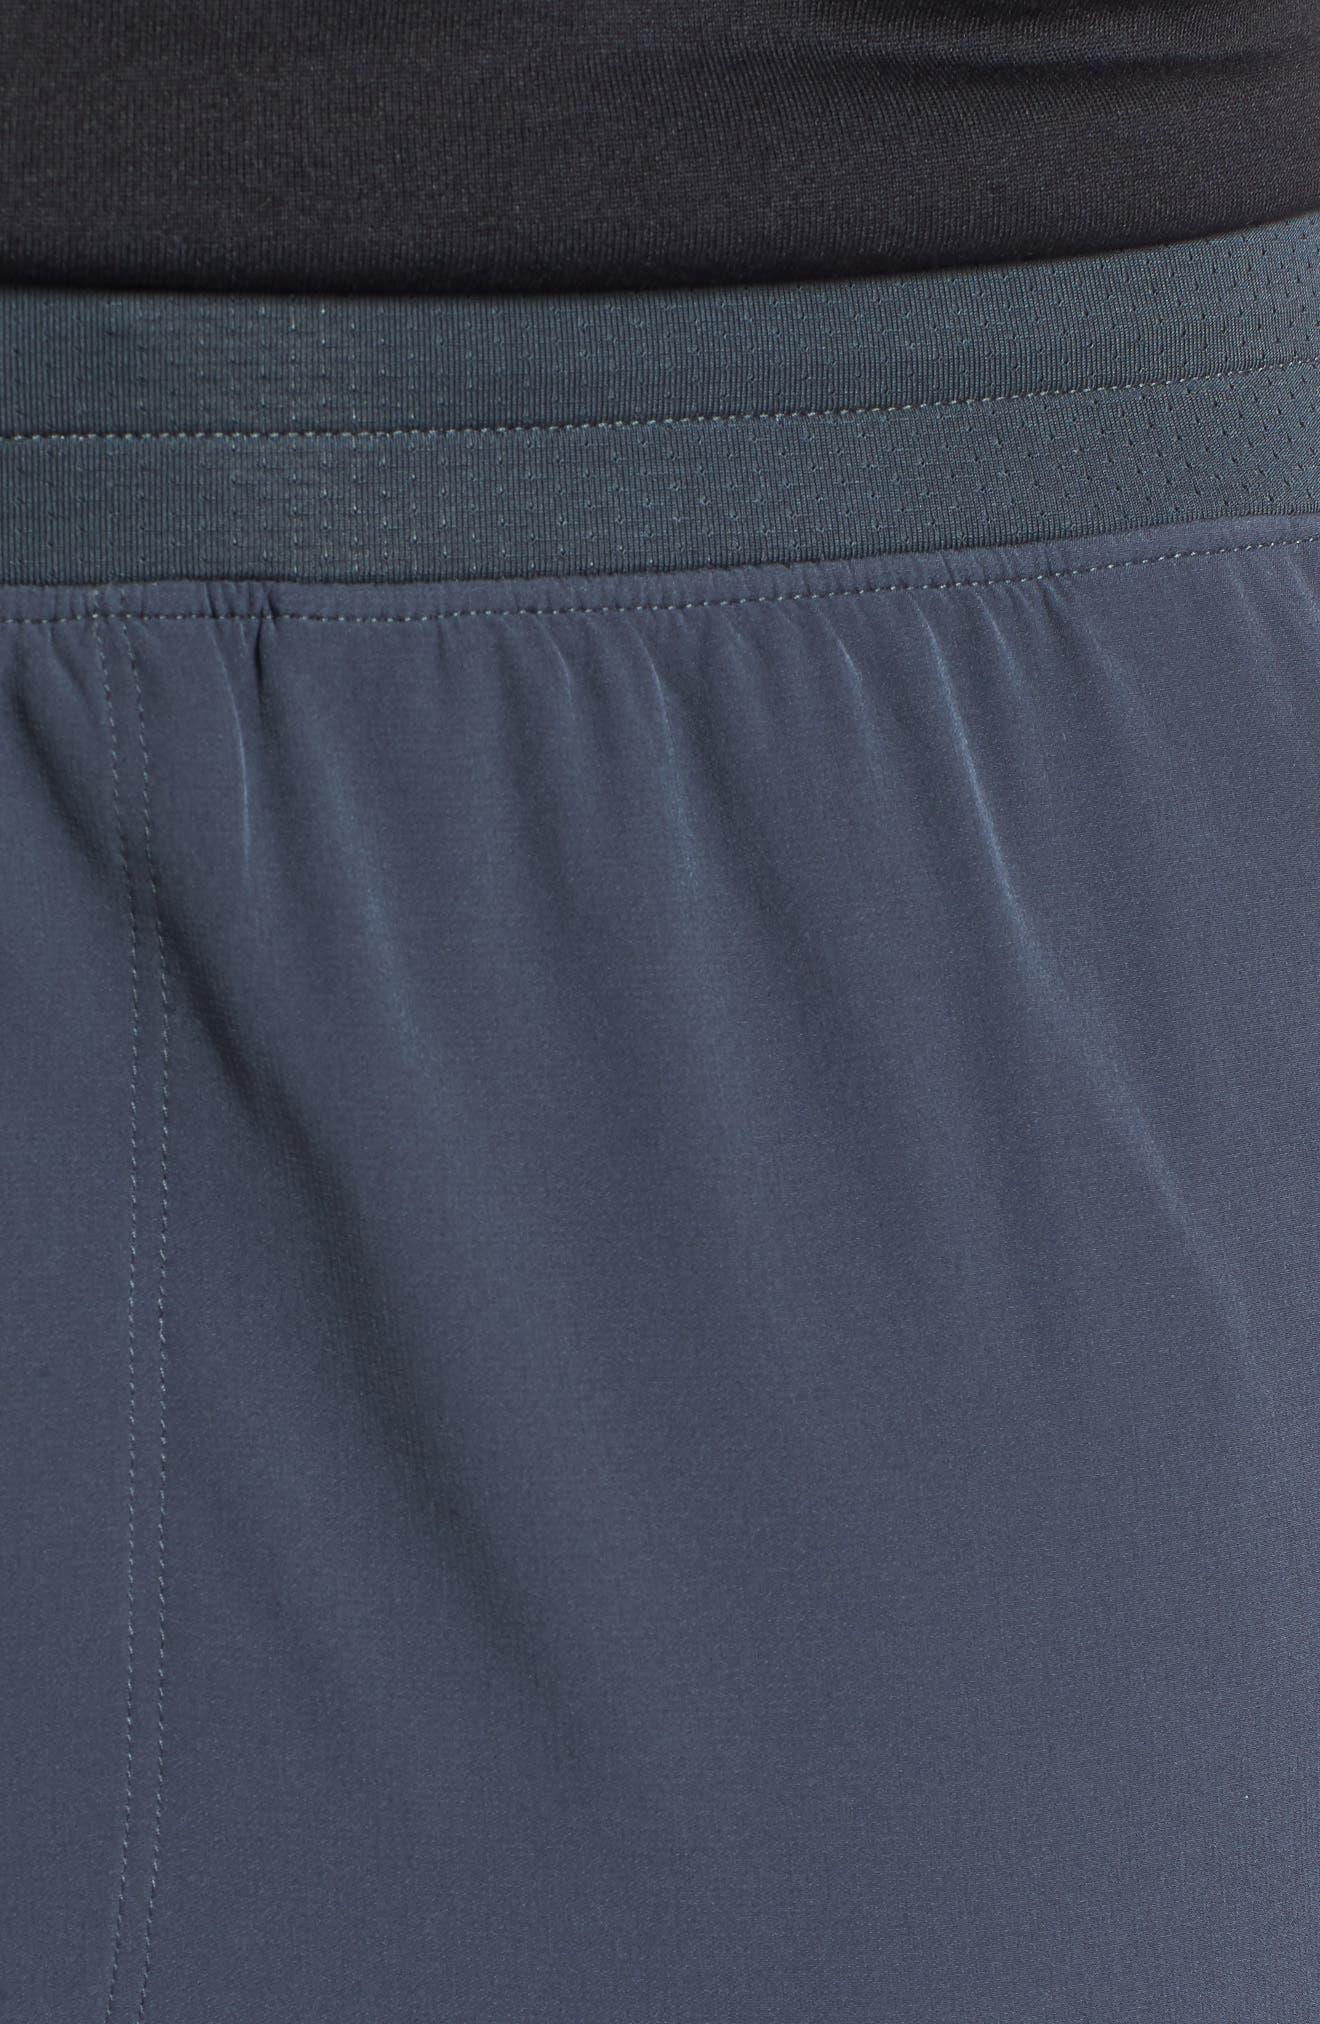 Perpetual Cargo Jogger Pants,                             Alternate thumbnail 4, color,                             STEALTH GRAY/ BLACK